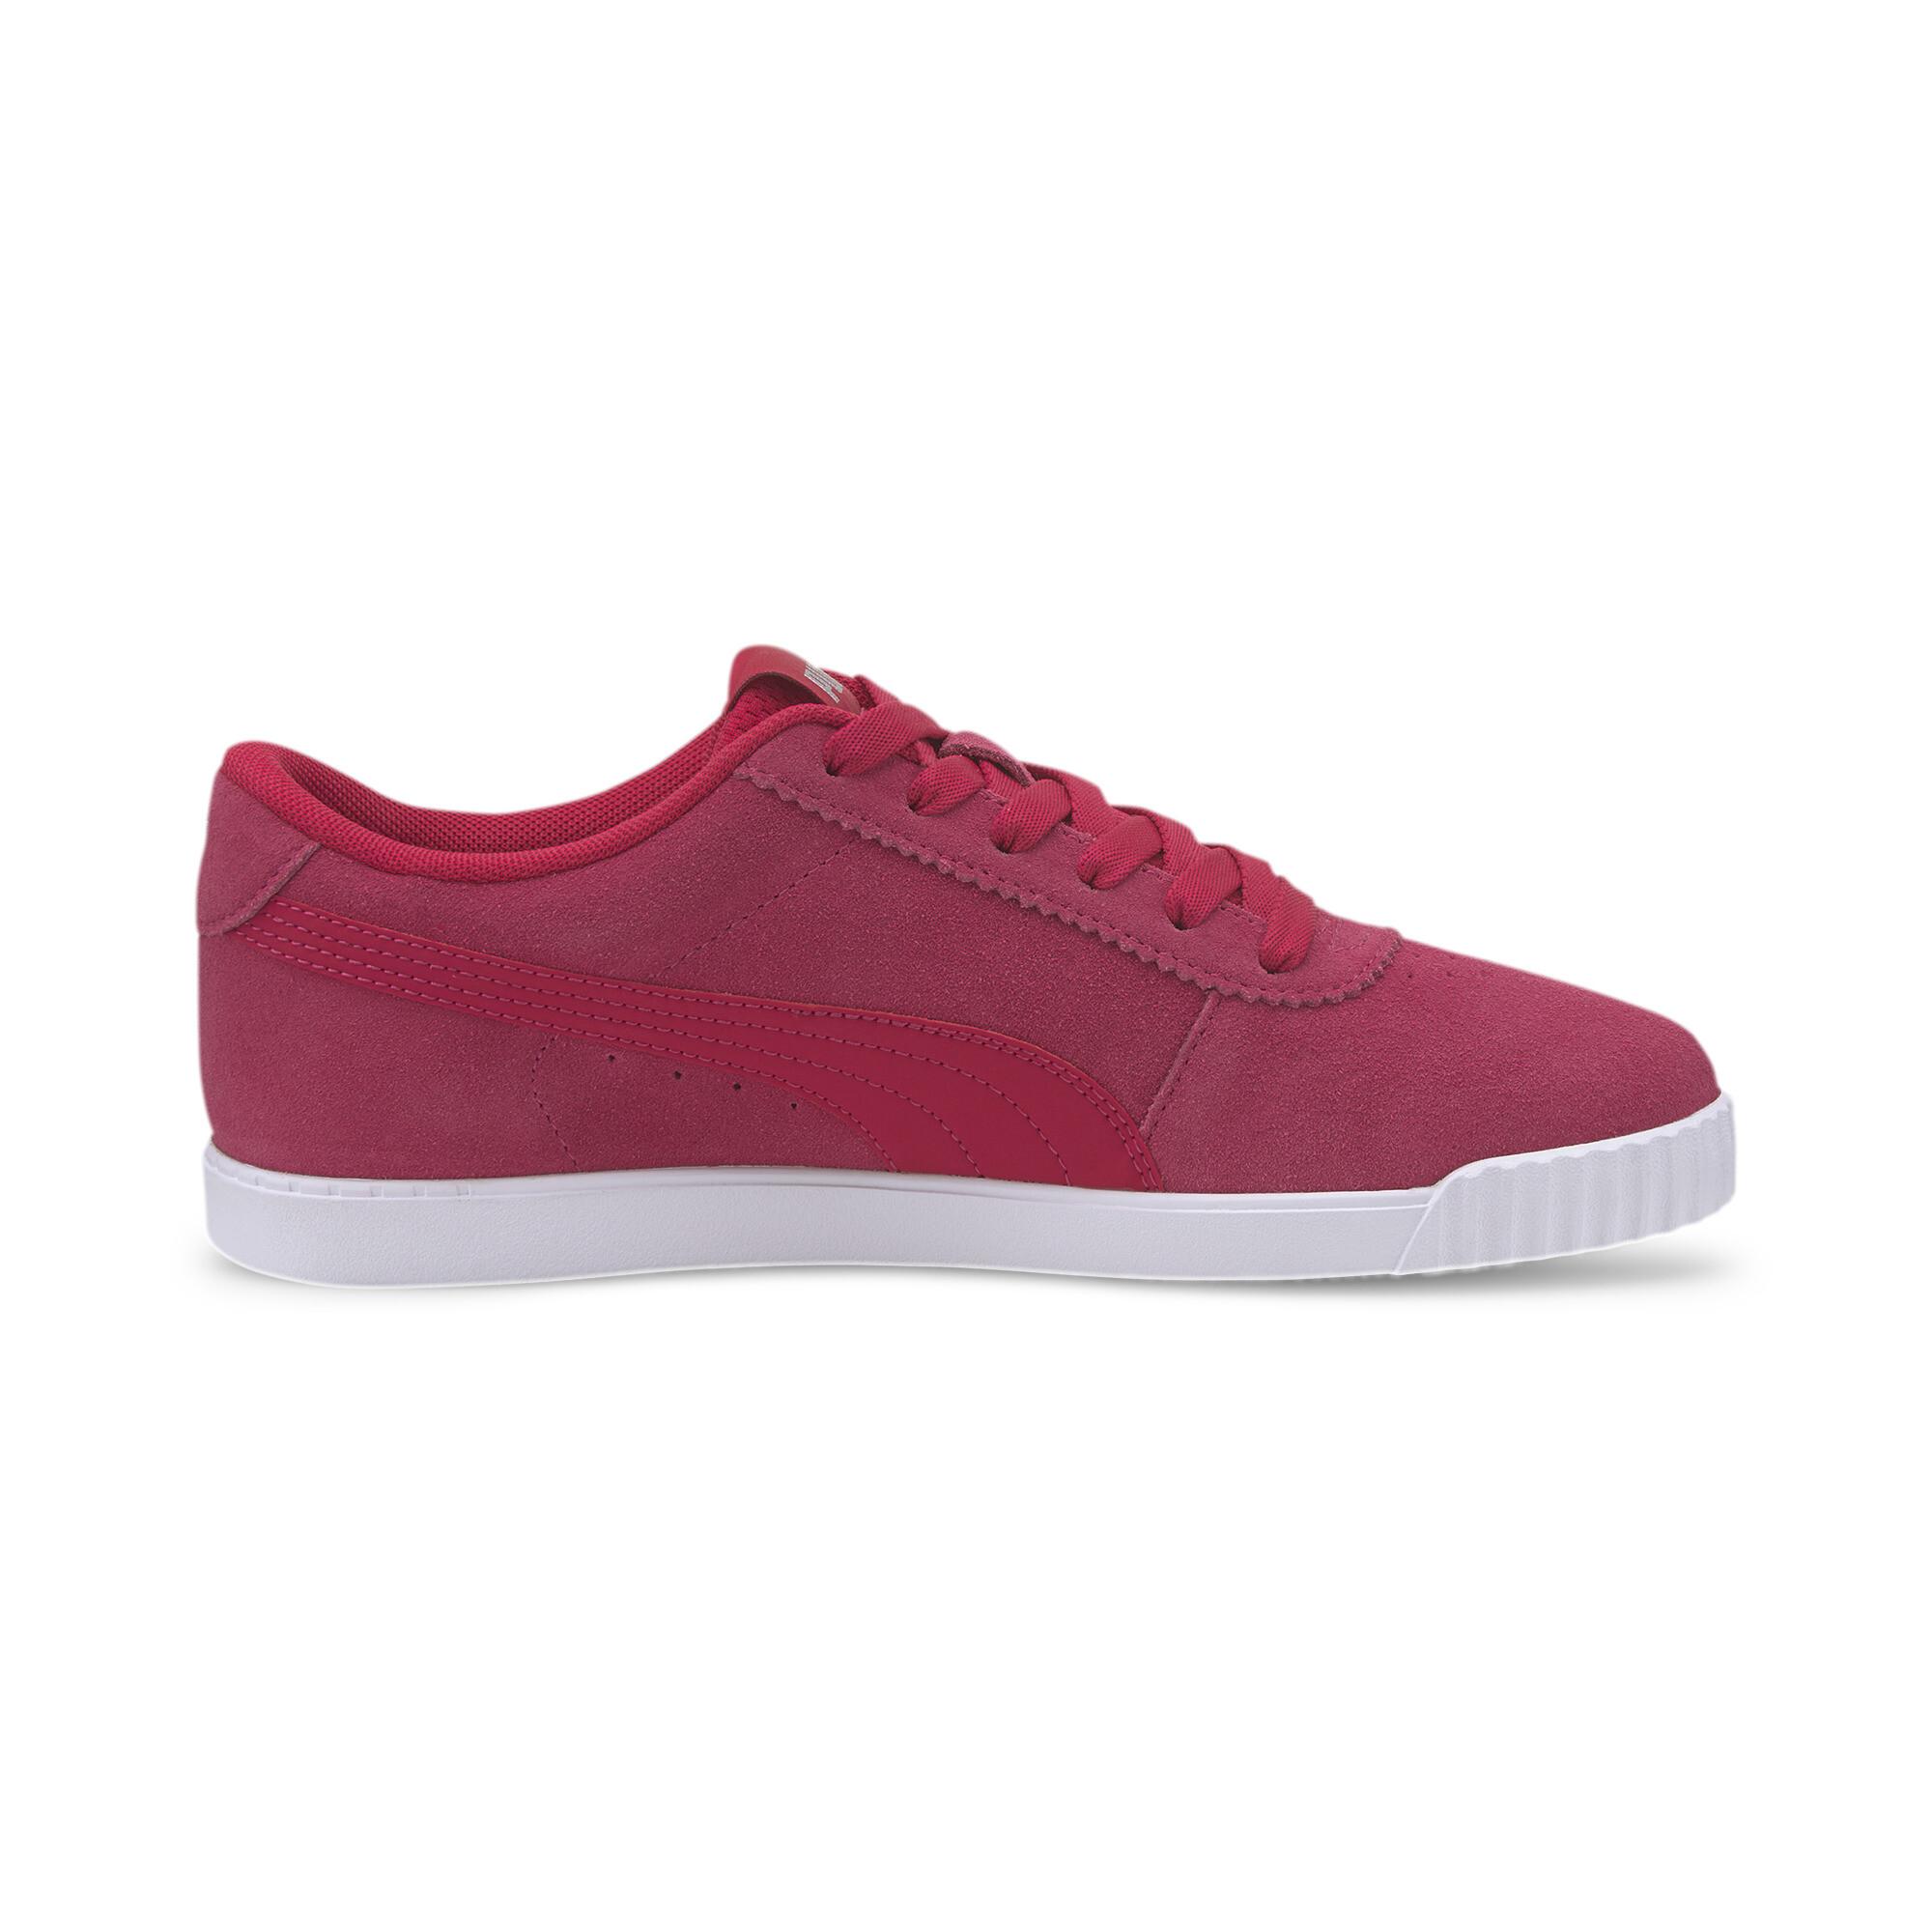 PUMA-Women-039-s-Carina-Slim-Suede-Sneakers thumbnail 14